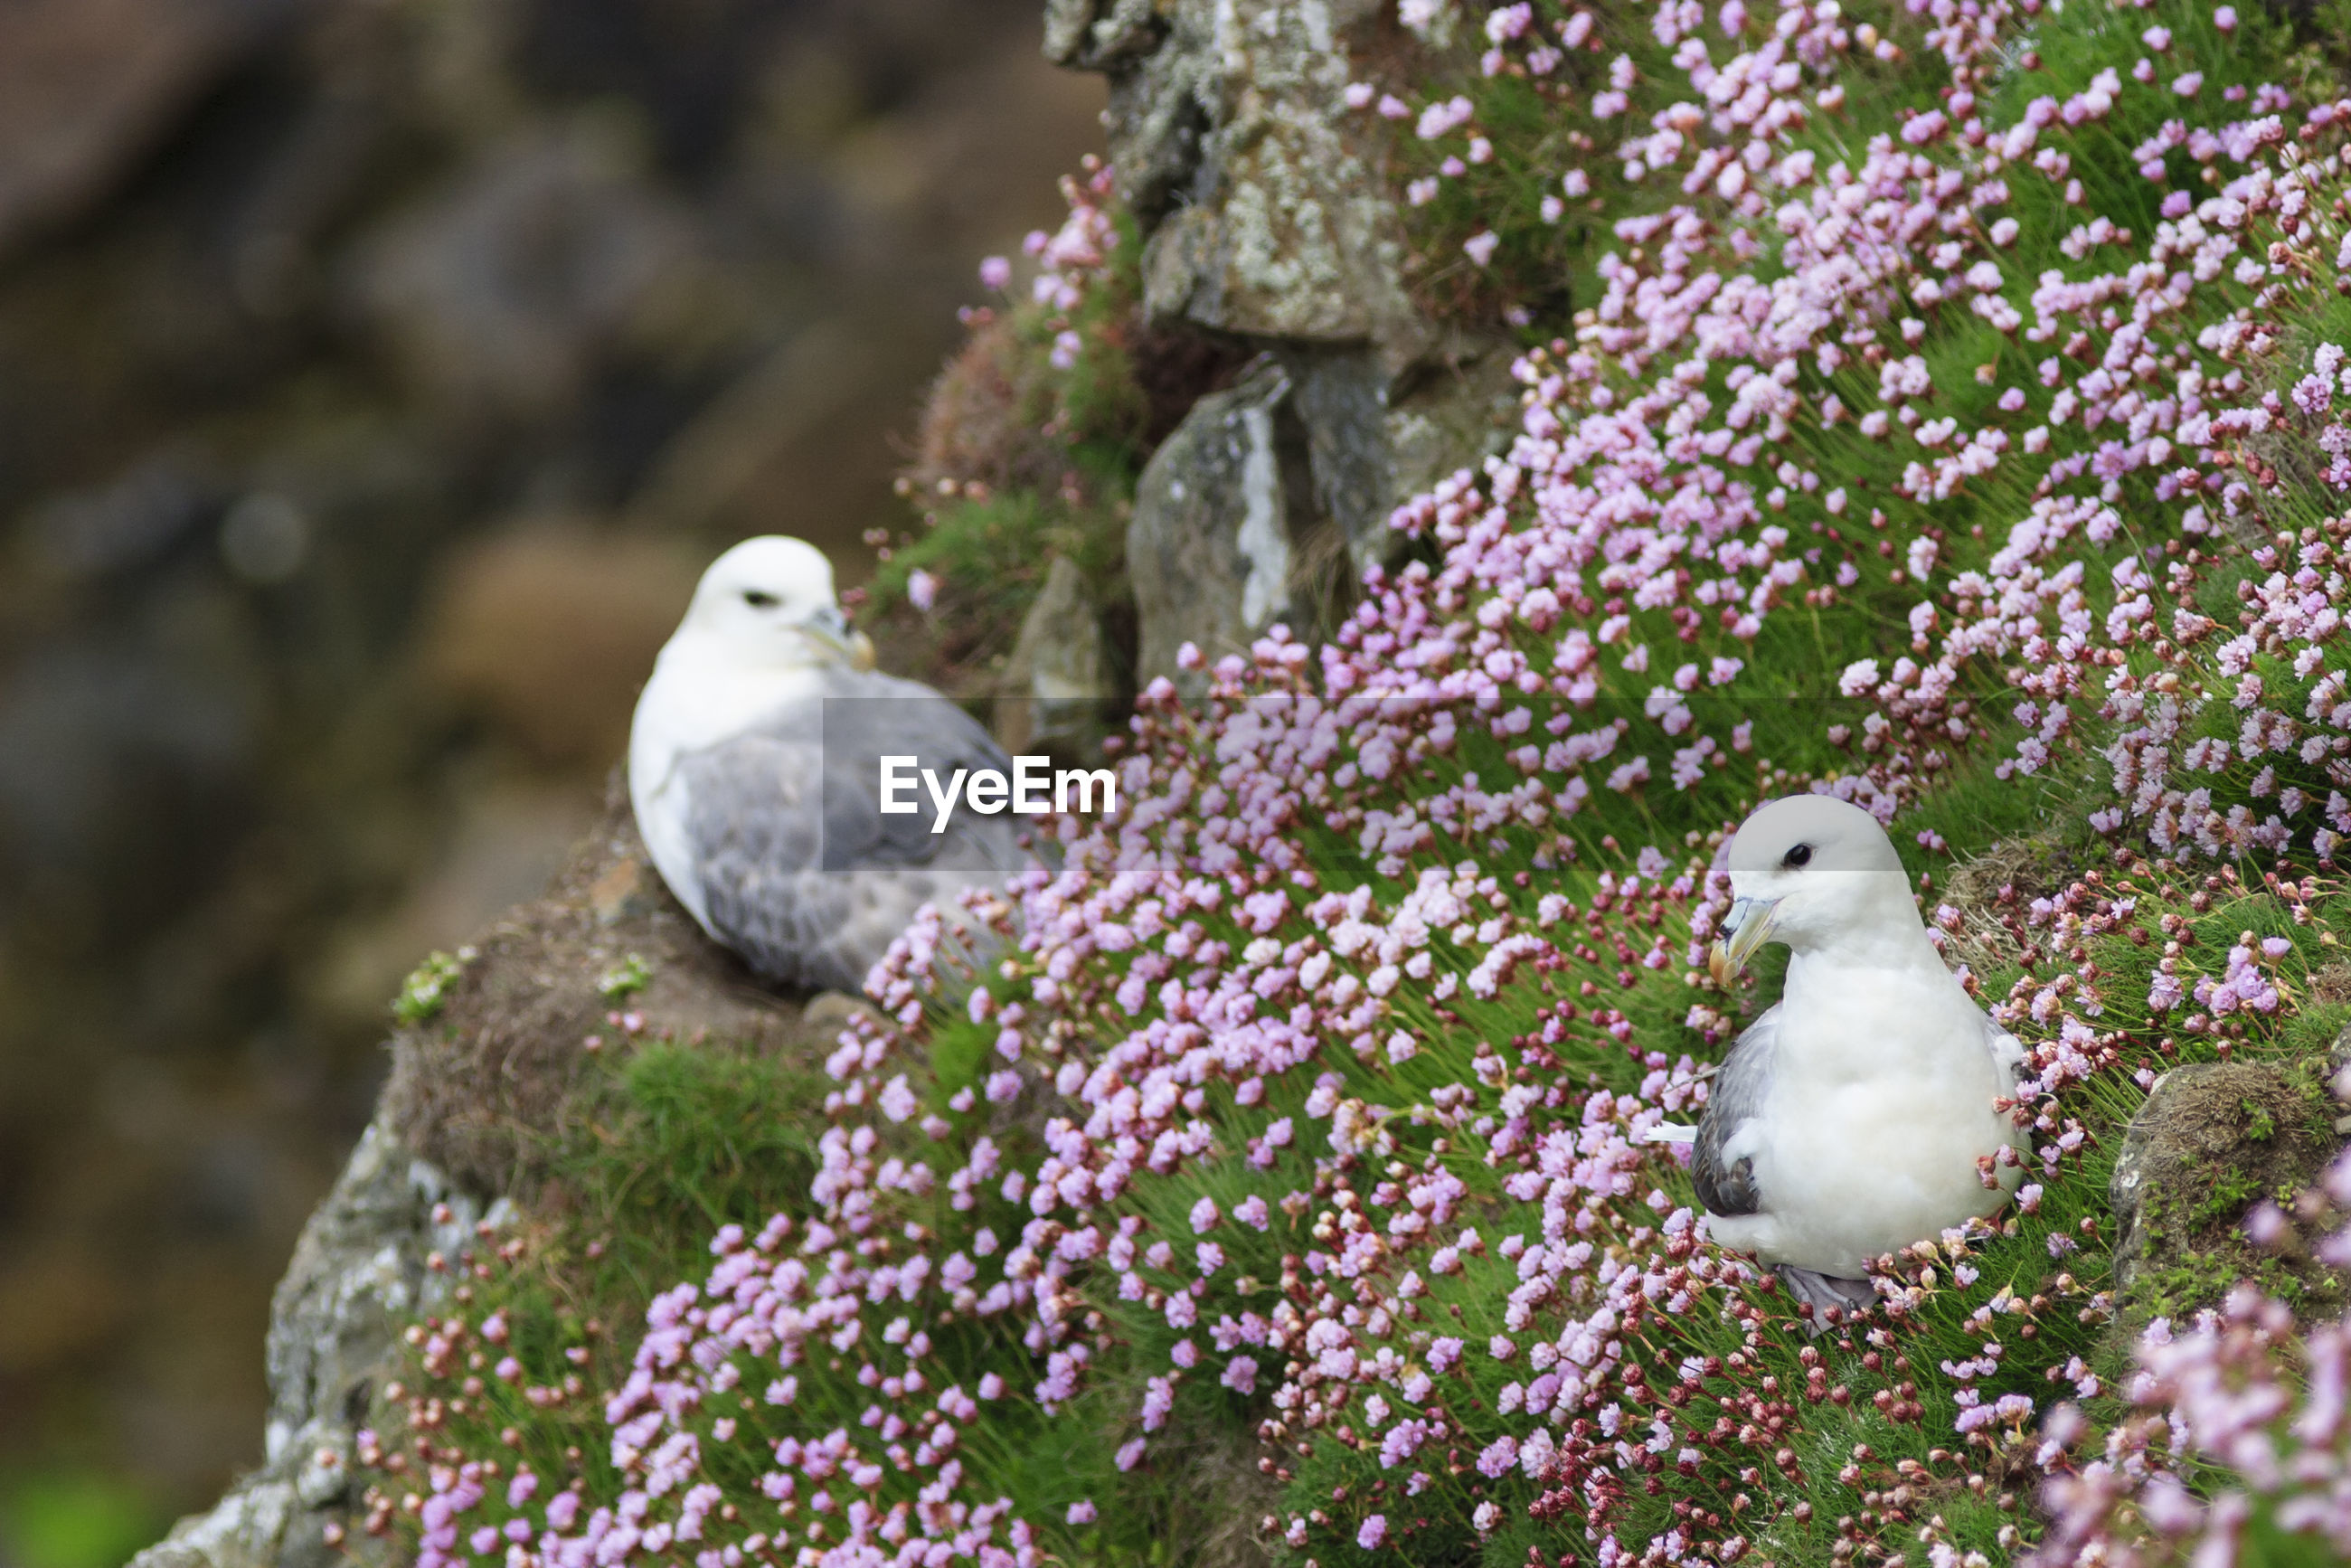 CLOSE-UP OF BIRD PERCHING ON FLOWERS